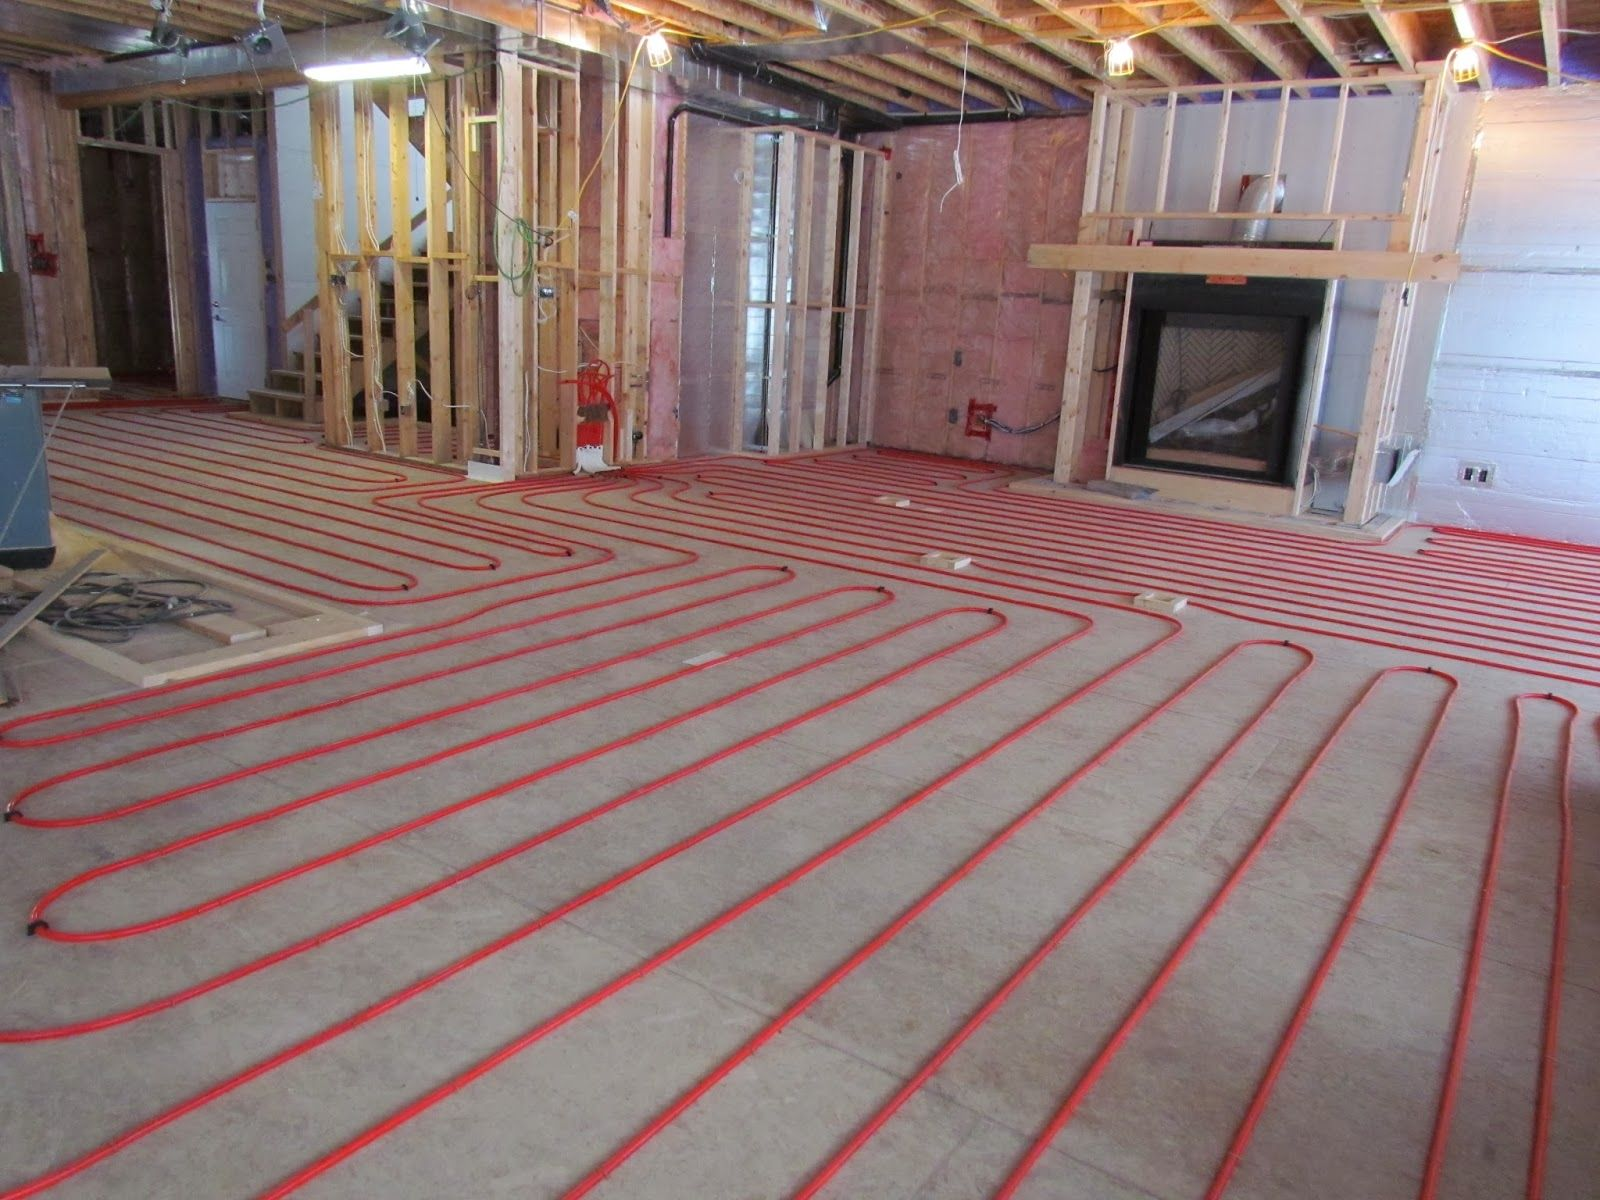 Pin by Debra G on Heated floor in 3  Floor heating systems